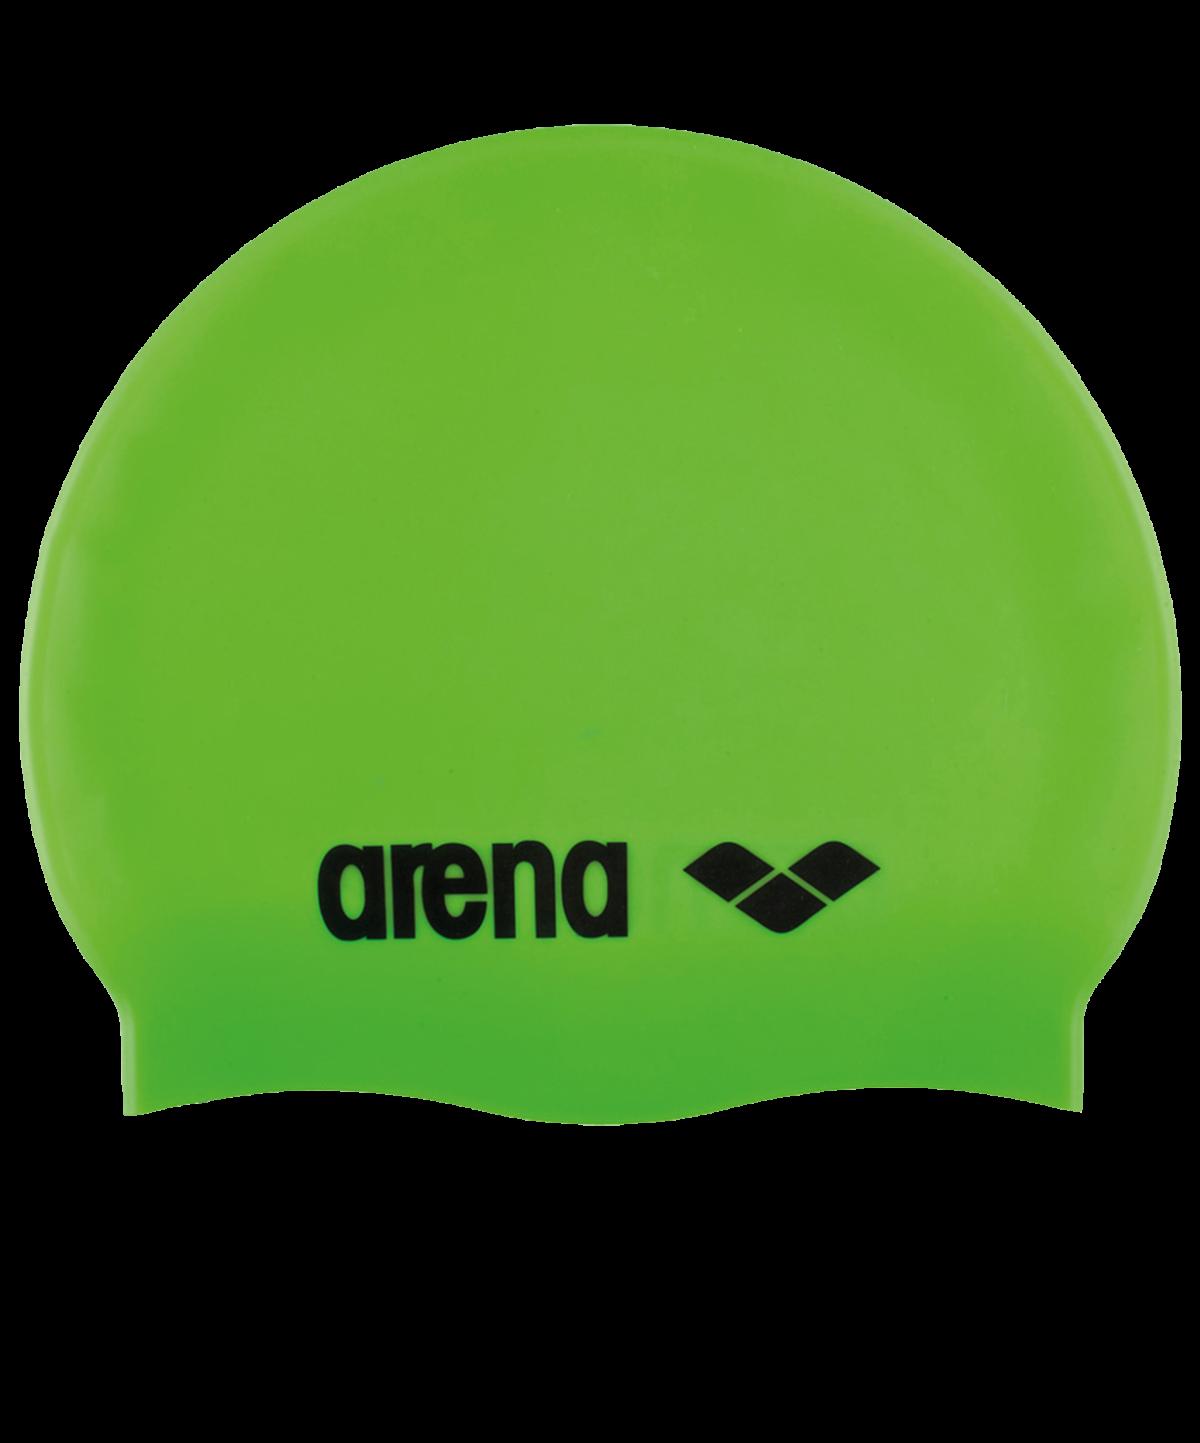 ARENA Шапочка для плавания Classic Silicone JR Acid lime/Black  91670 65 - 1